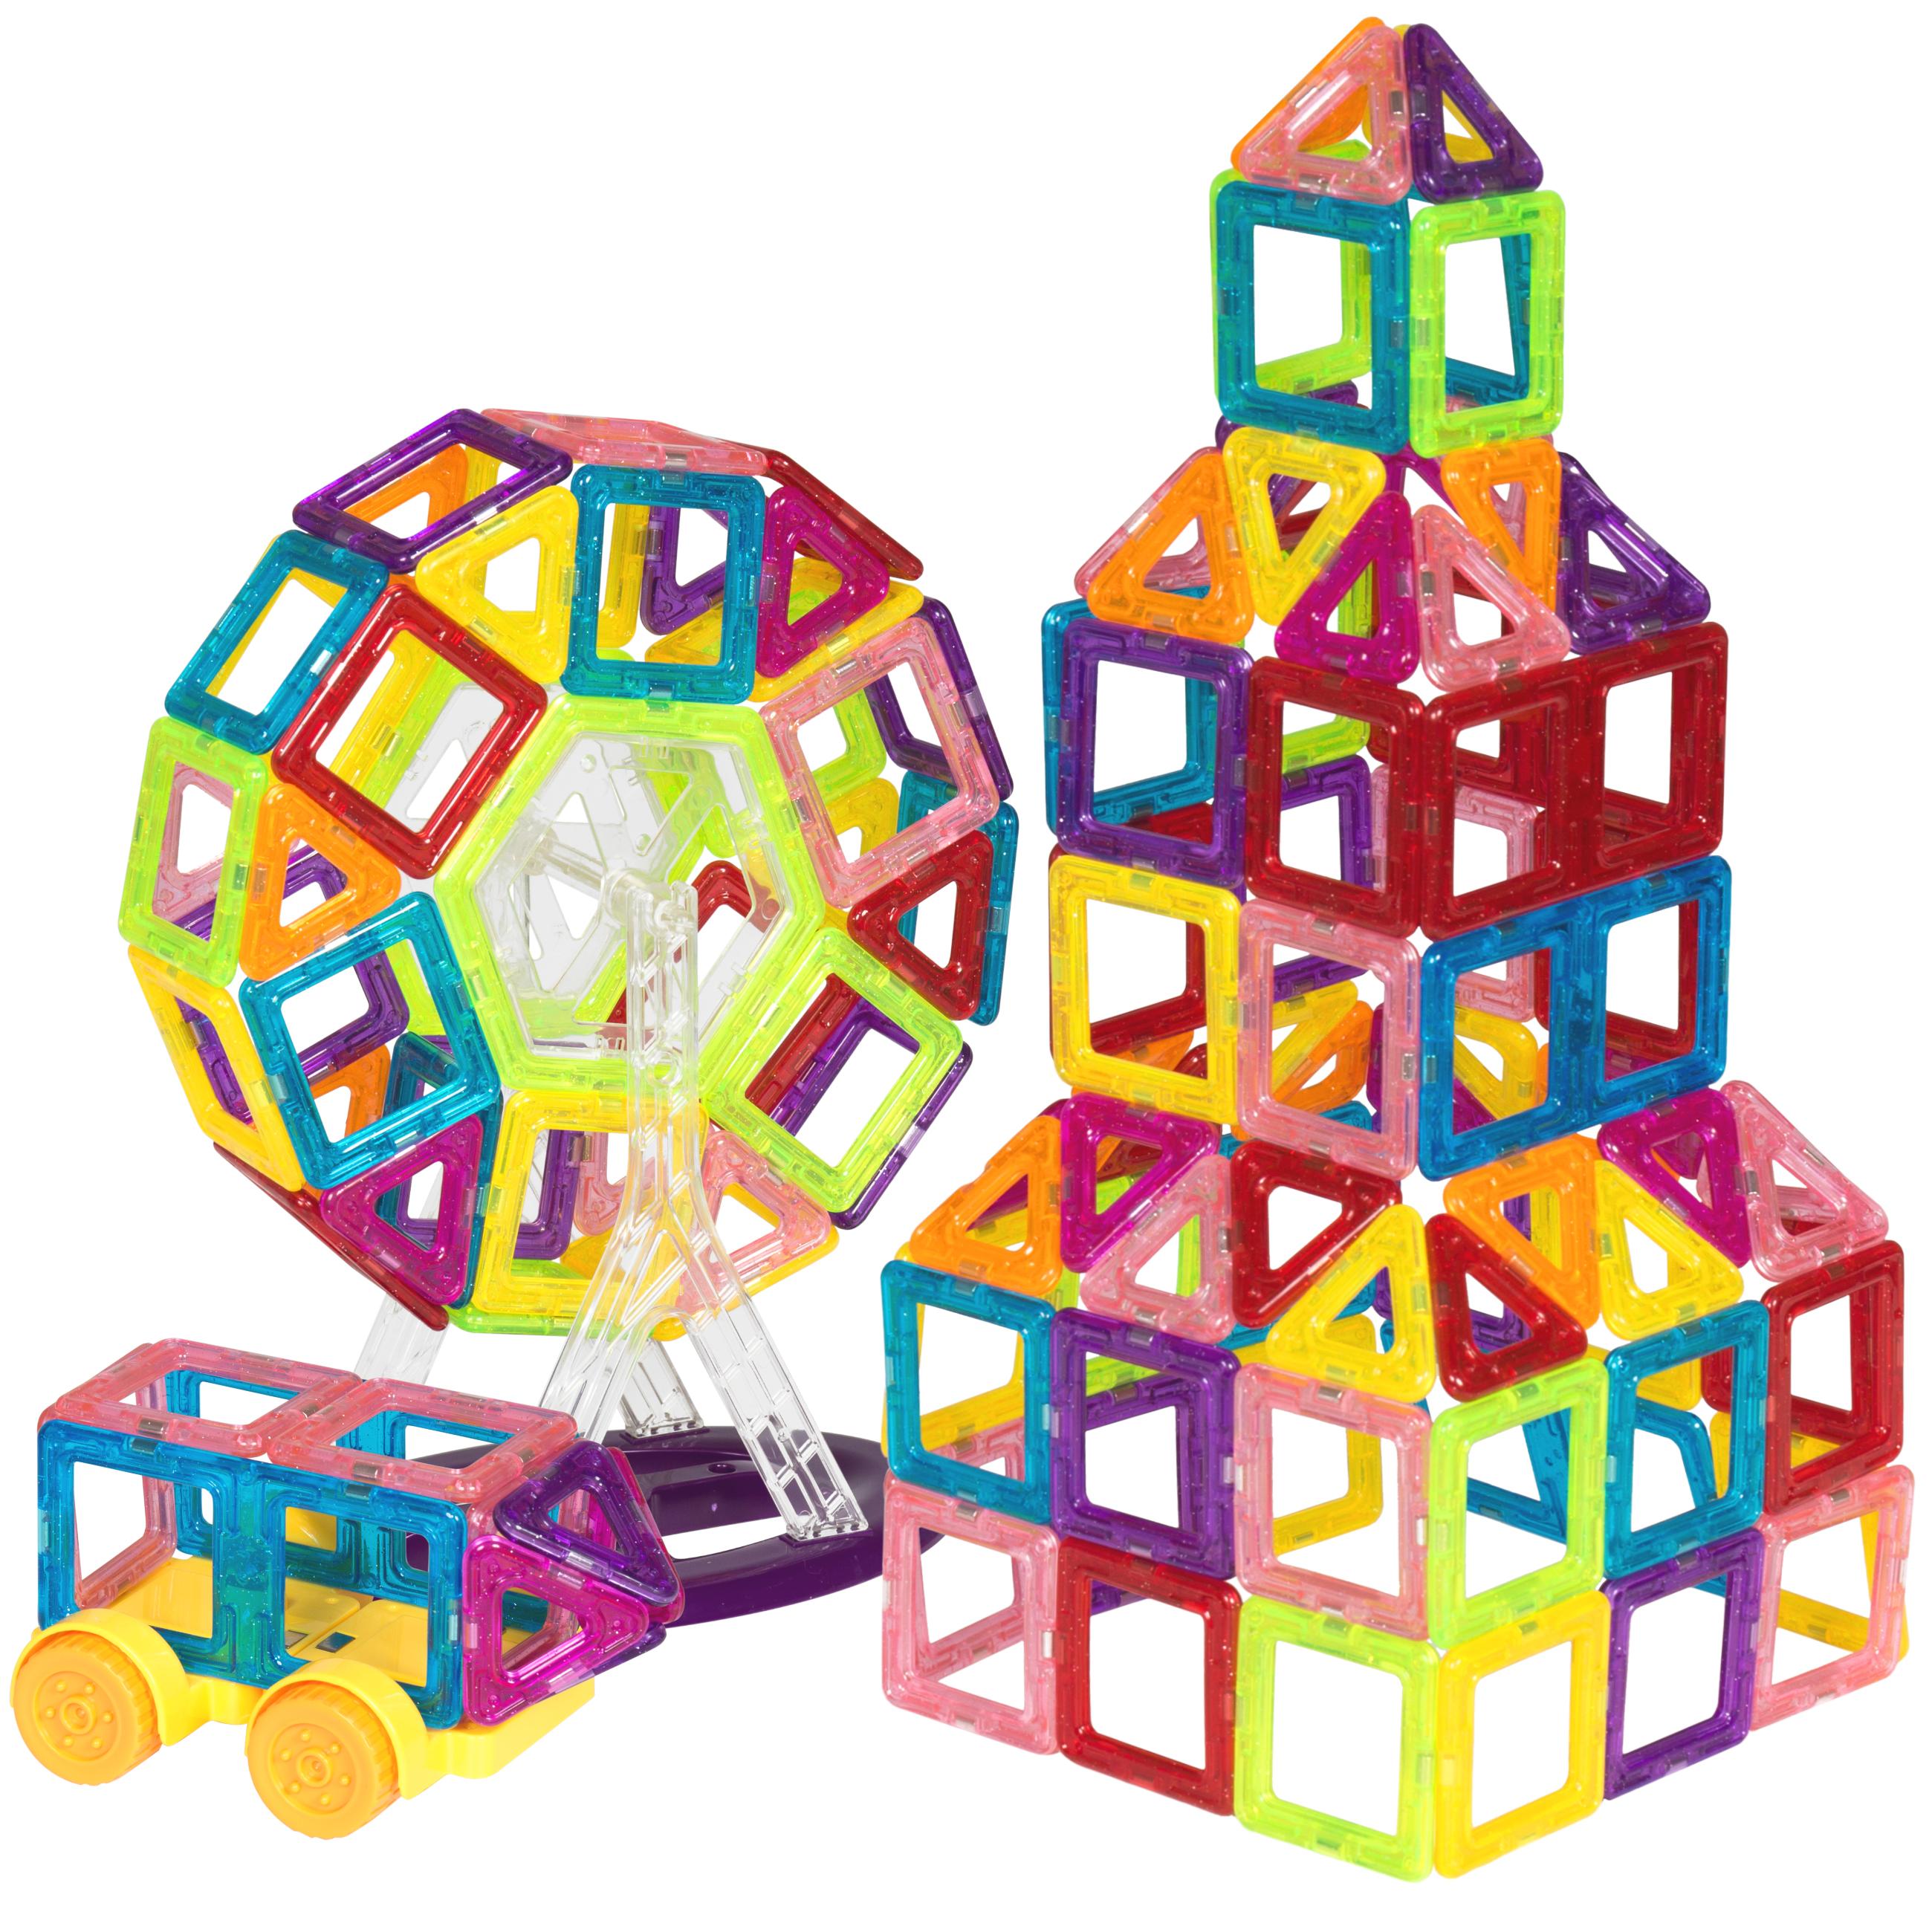 Best Choice Products 158-Piece Kids Mini Clear Magnetic Building Block Tiles Educational STEM Toy Set - Multicolor